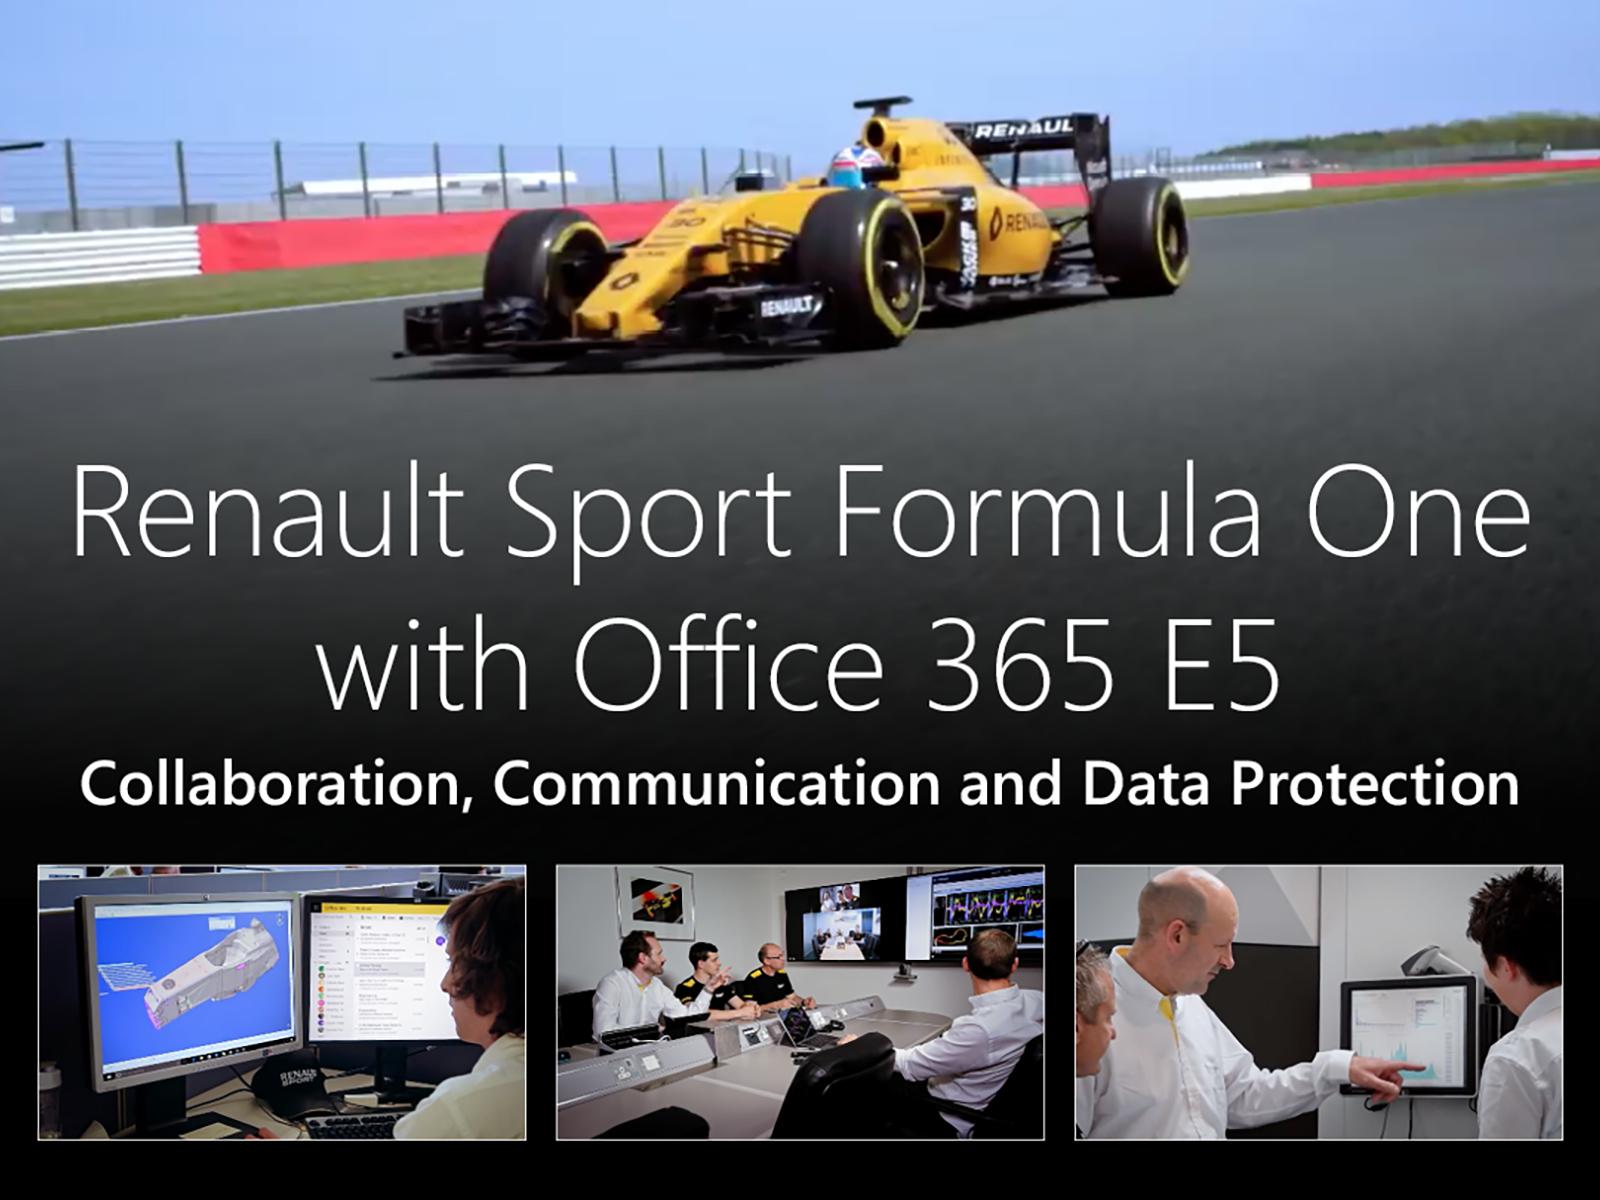 Artwork for Renault Sport Formula One & Office 365 E5